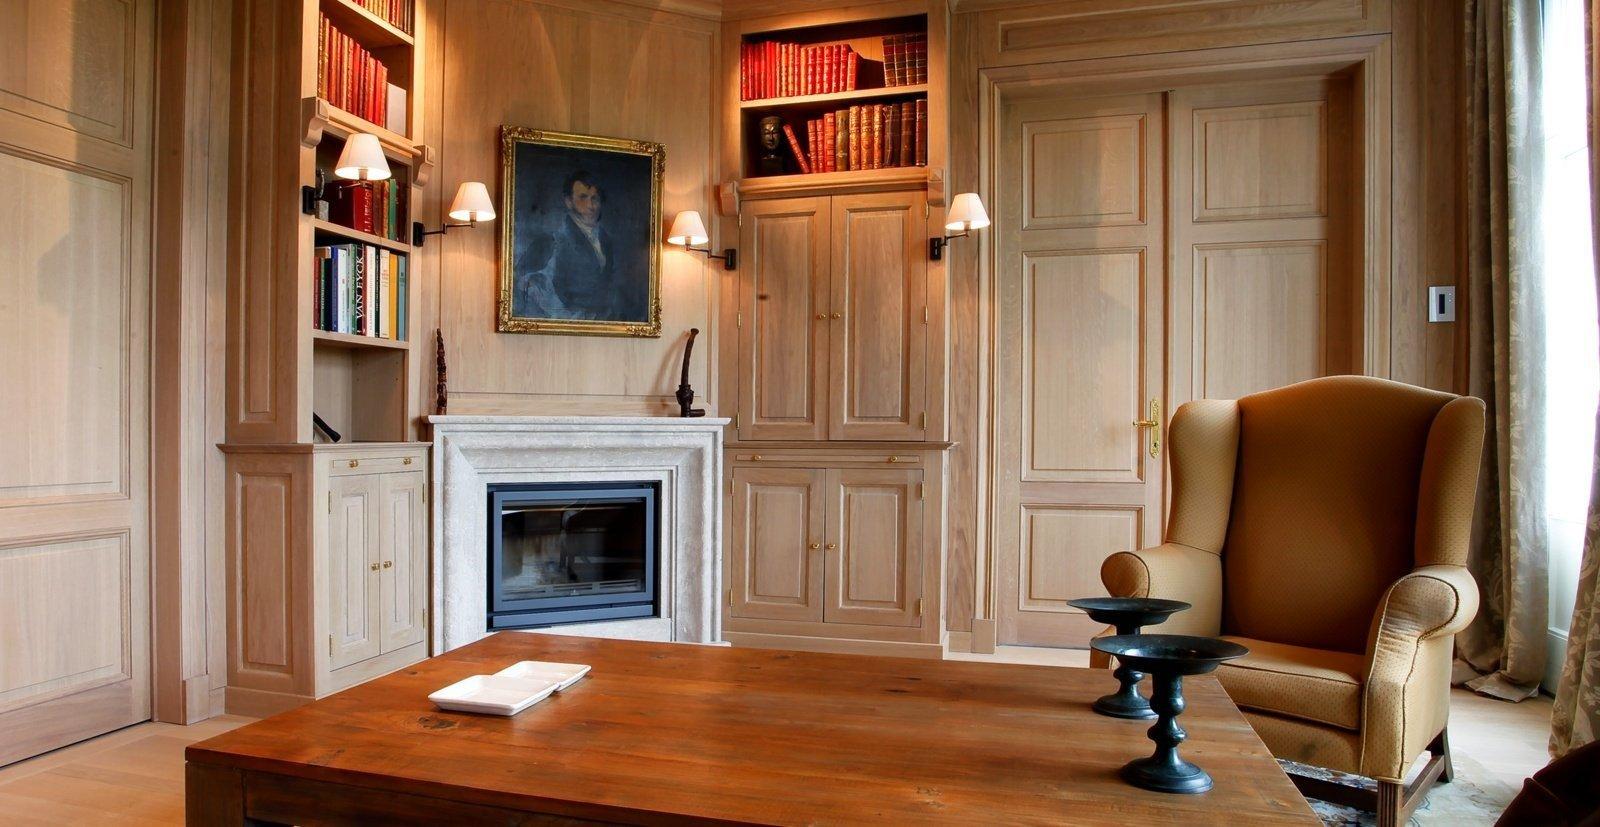 Bibliotheek - St Martens Latem